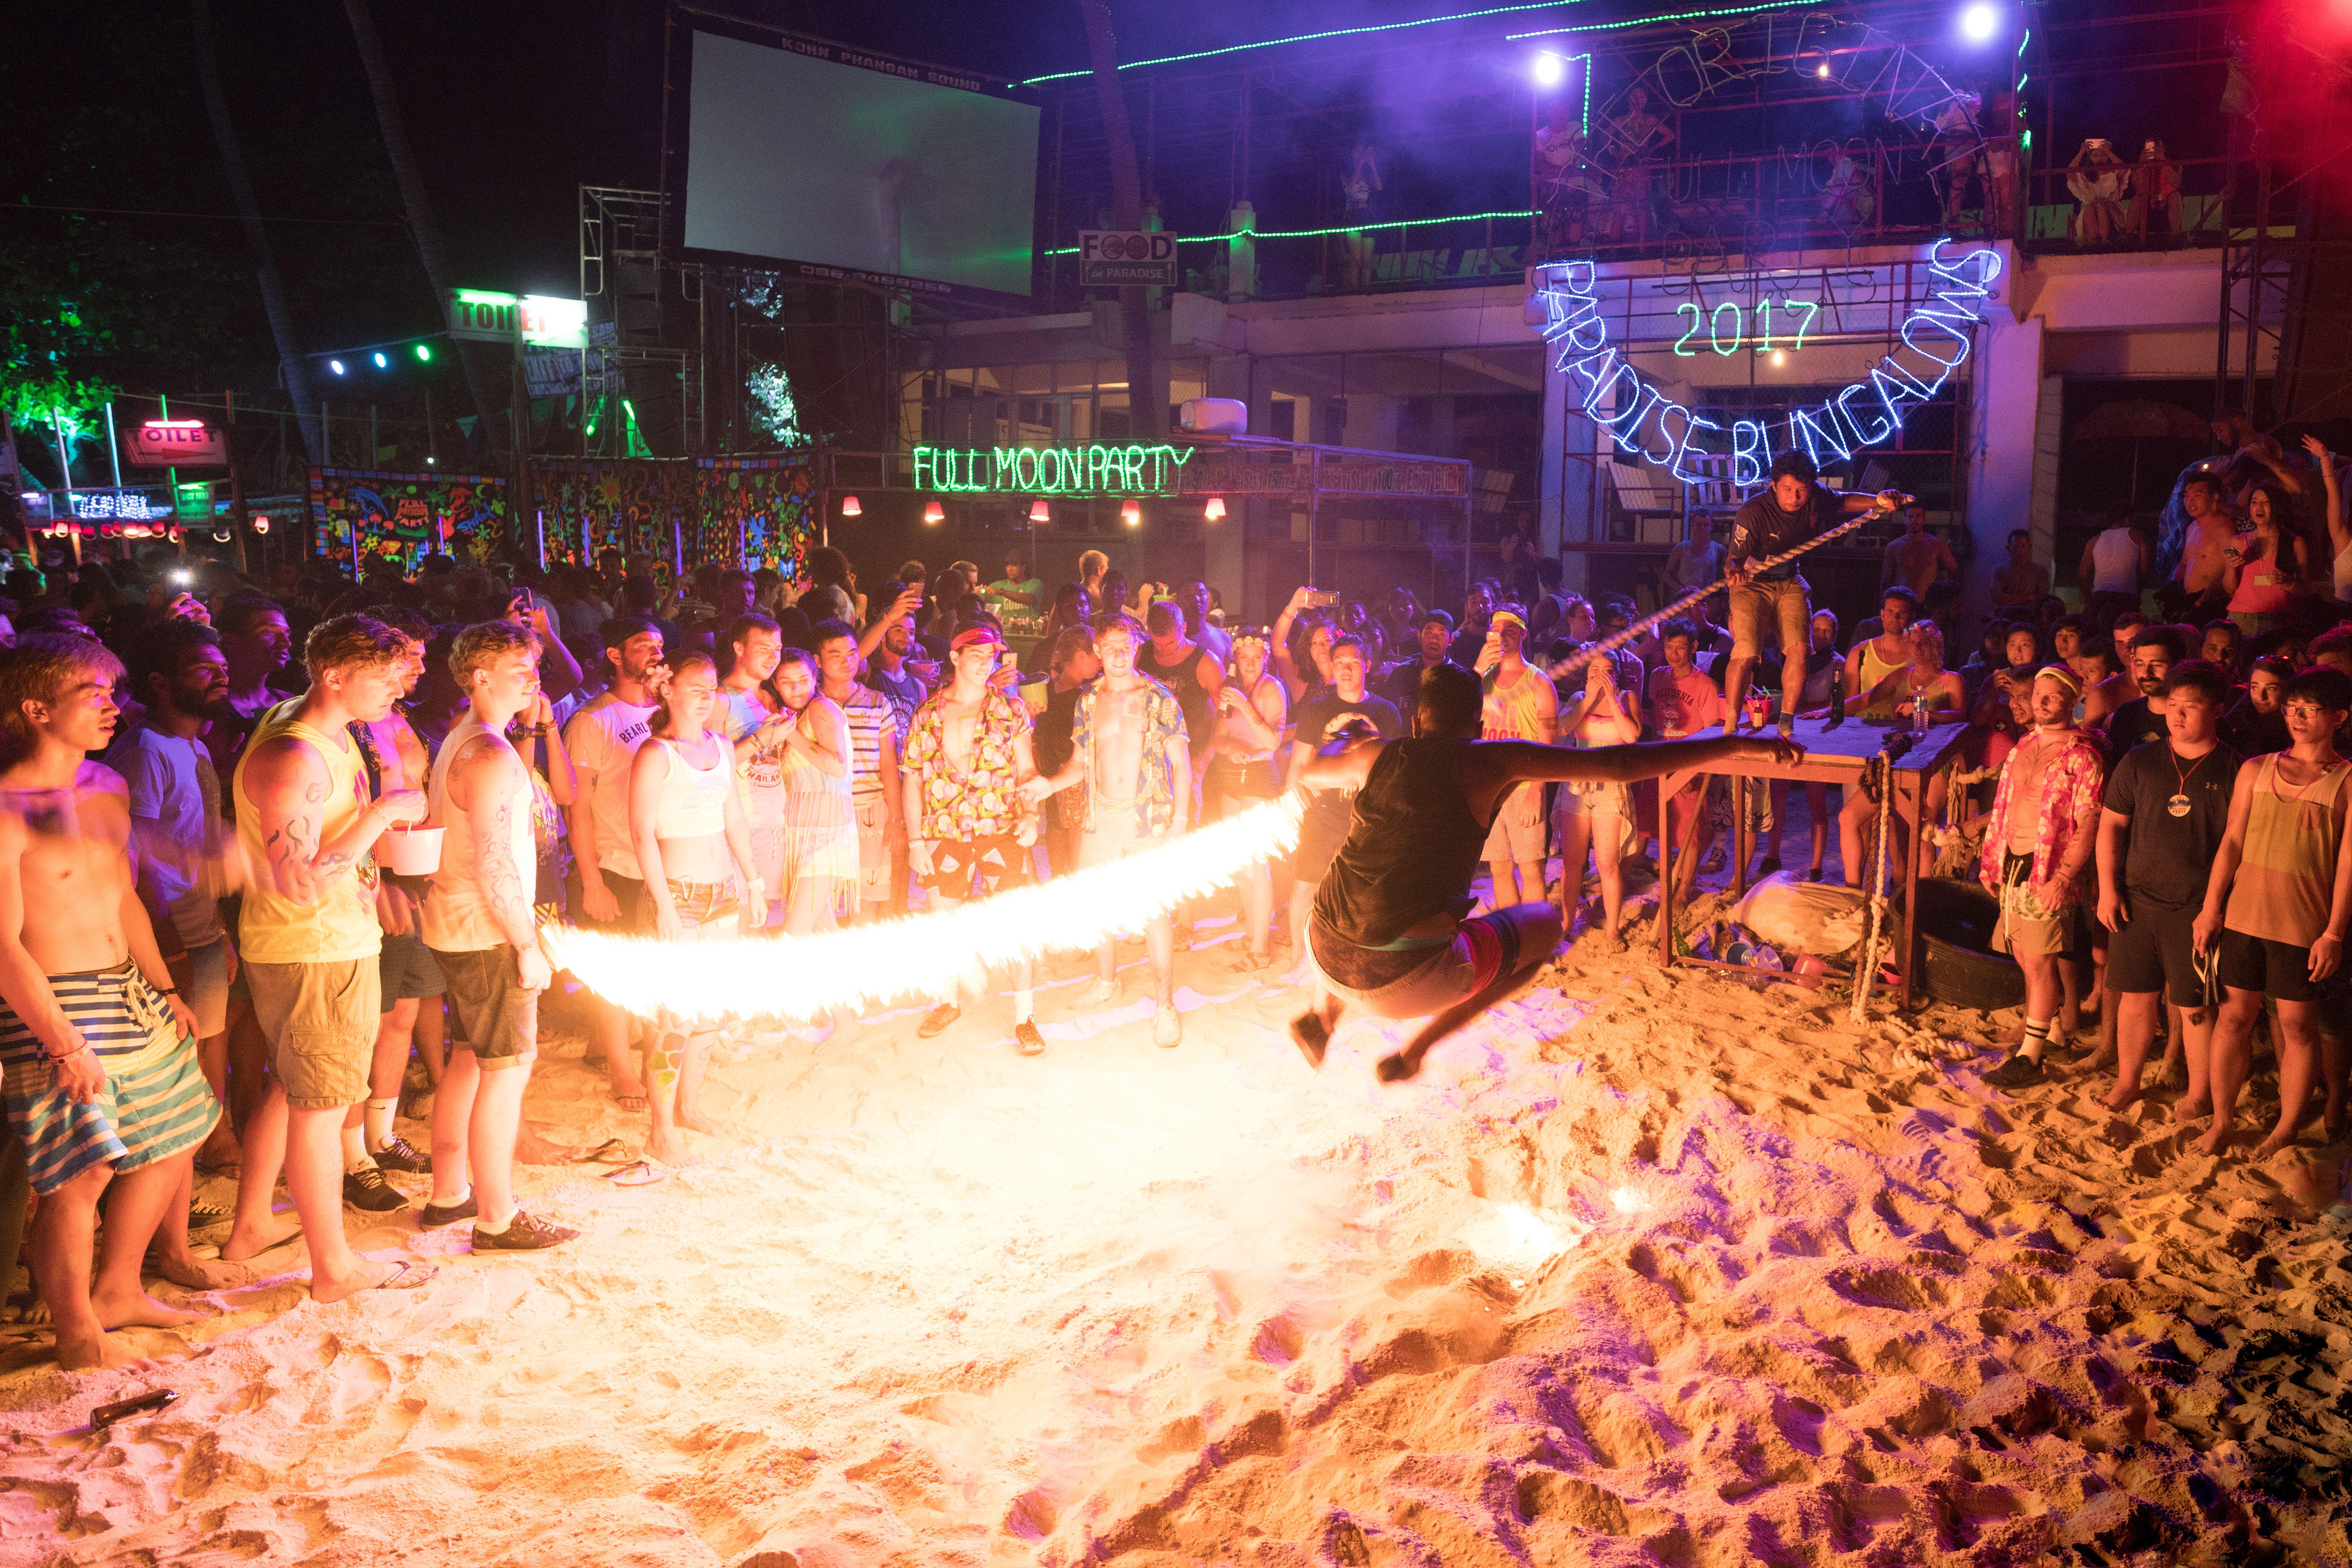 Fire jumping at the Koh Phangan Full Moon Party